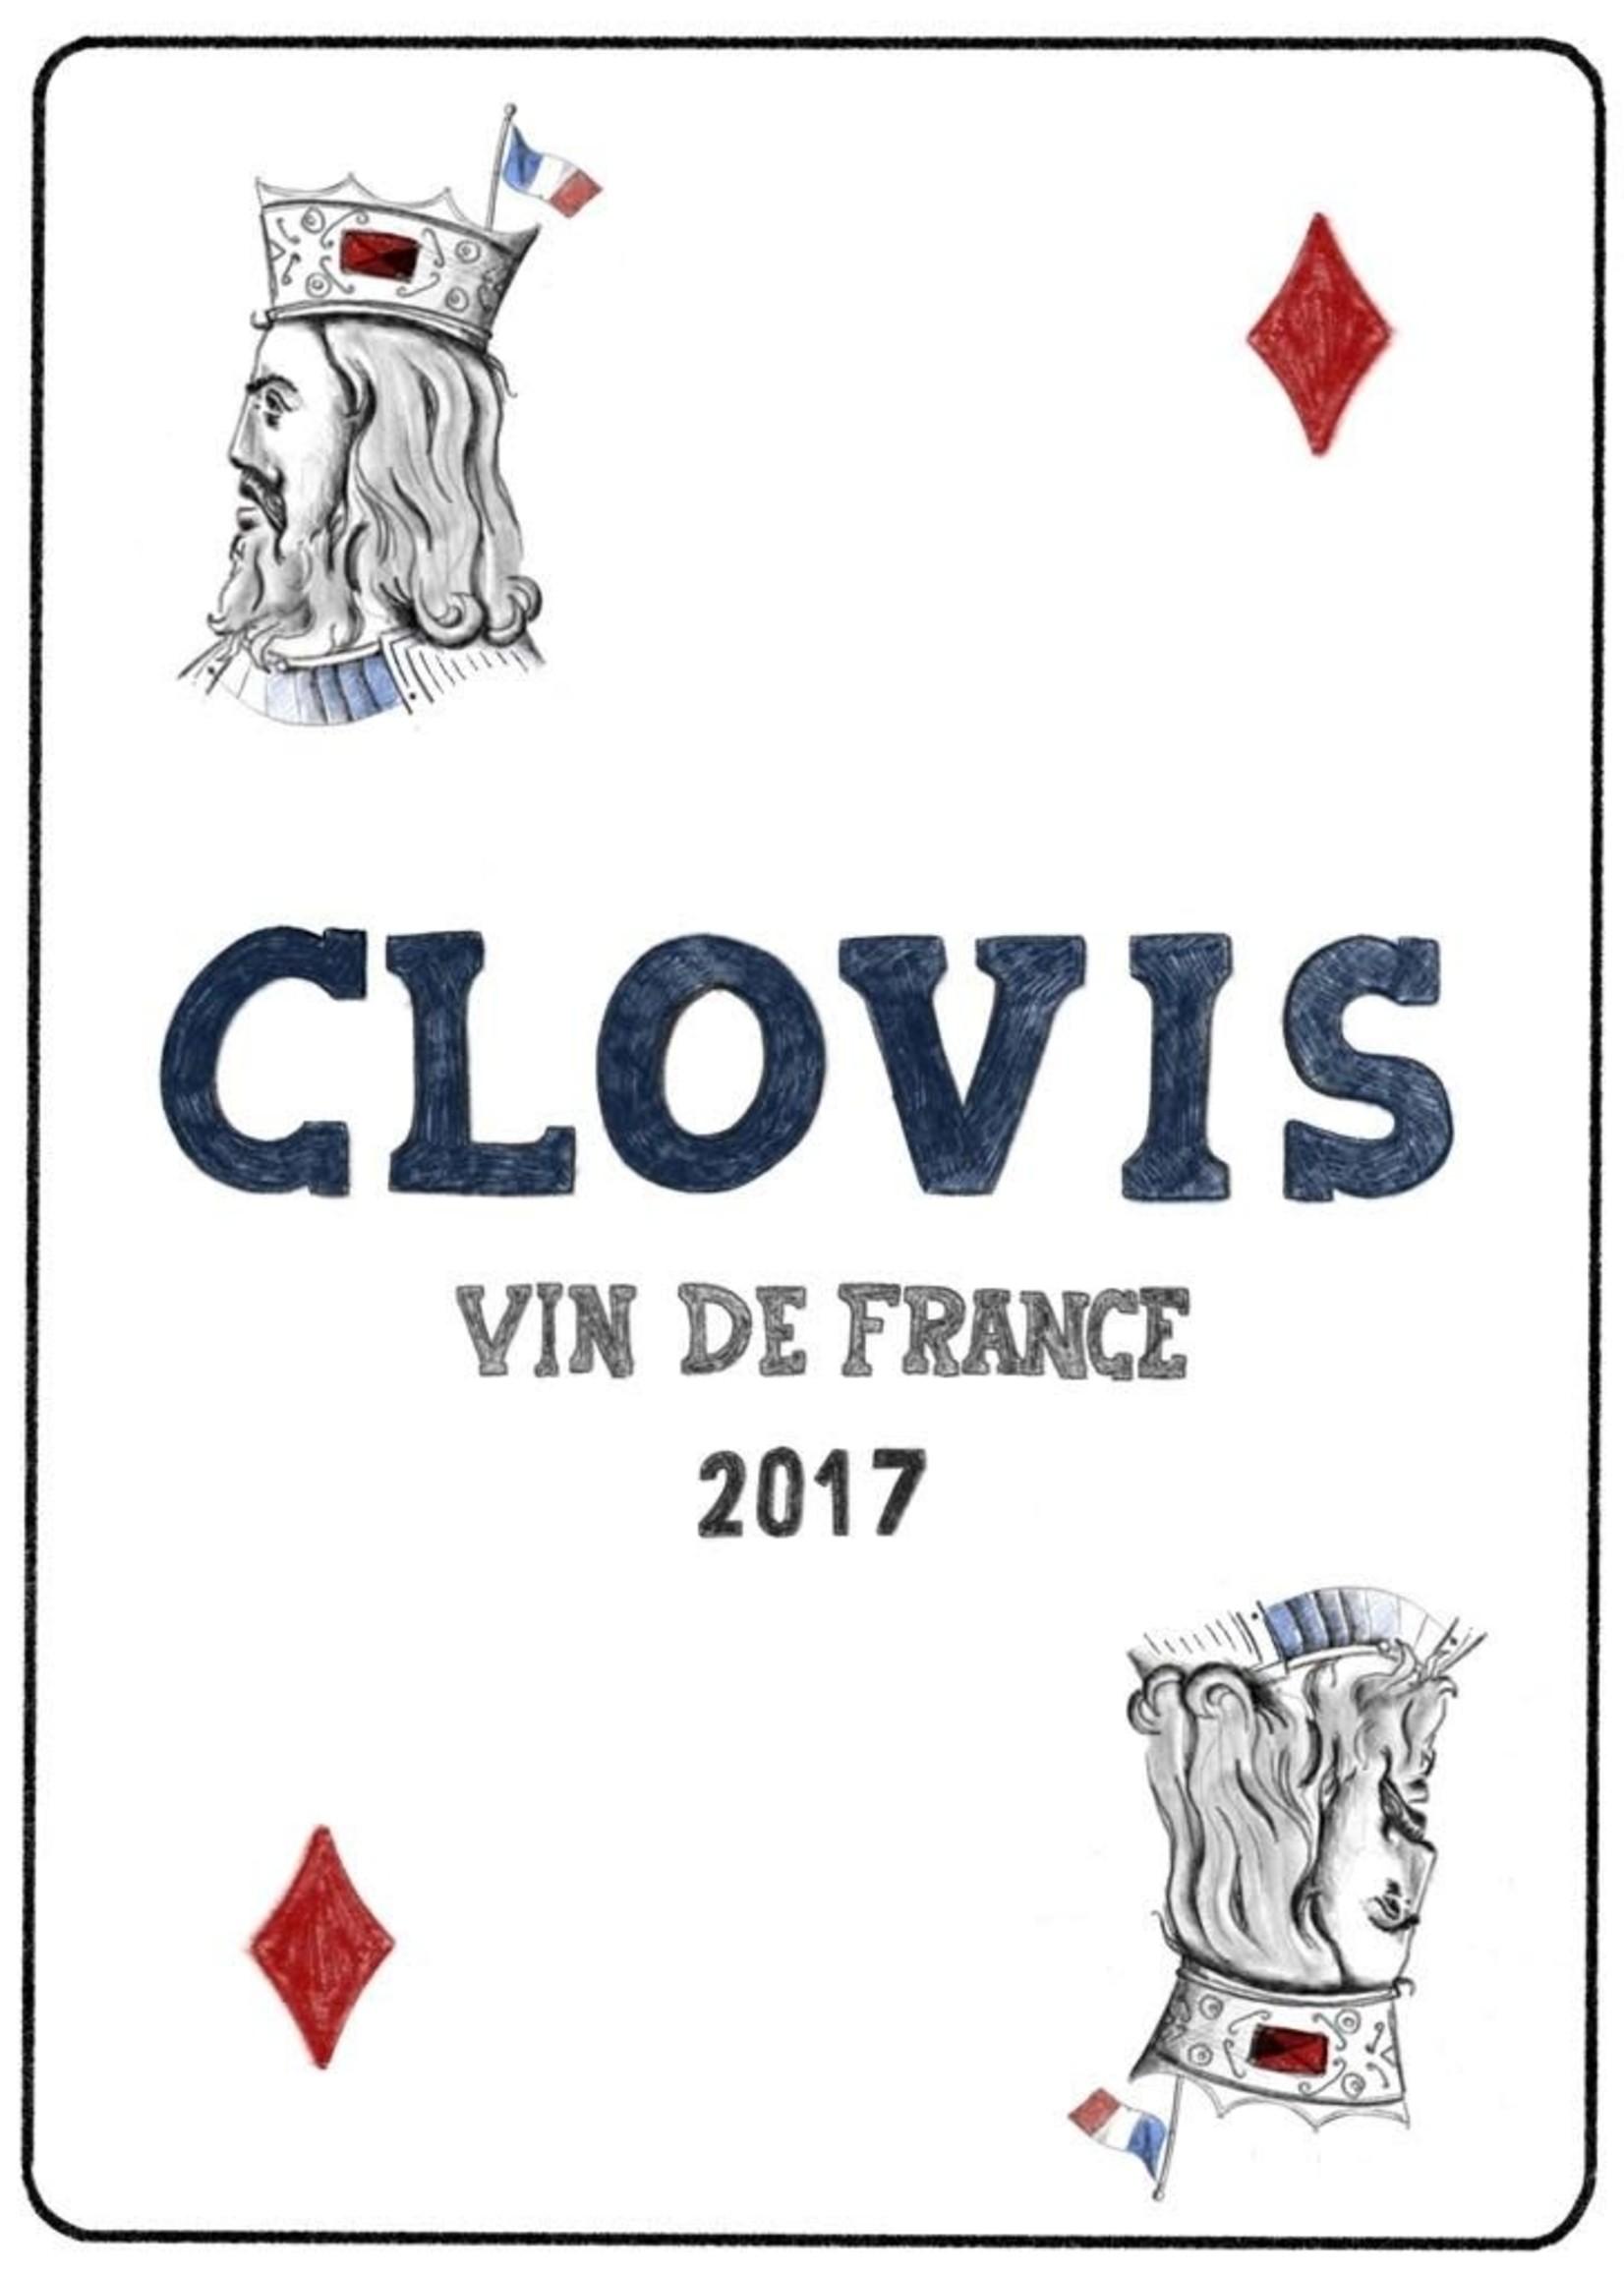 Clovis Wines Clovis Wines / Rouge 2019 / 750mL